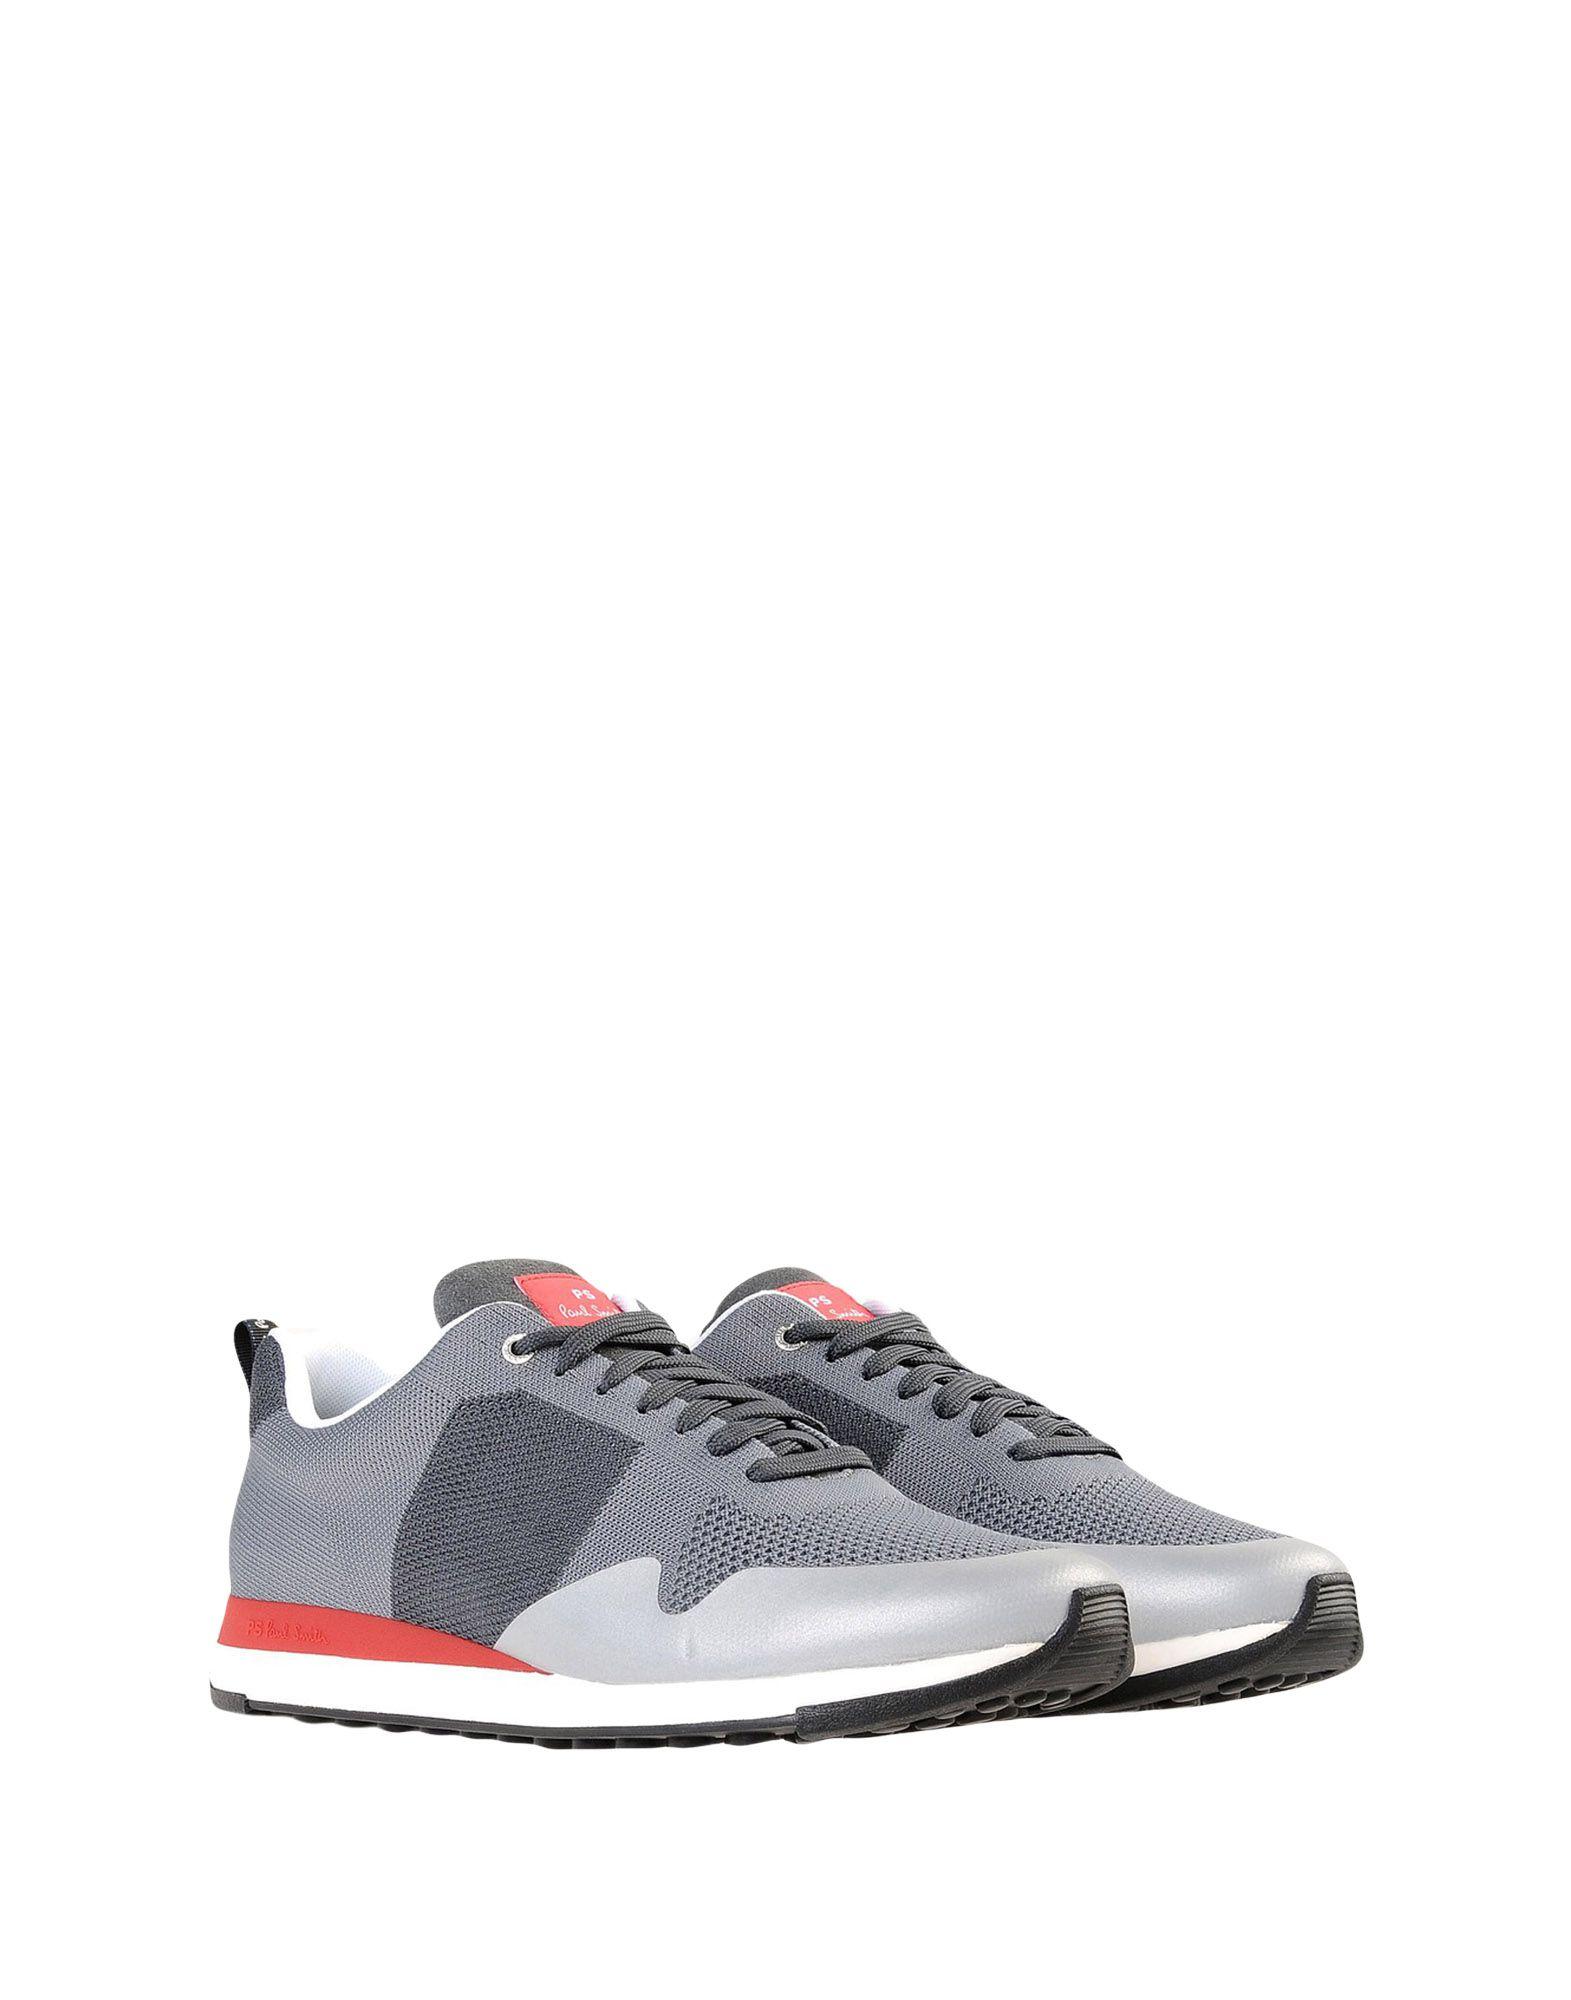 Ps By Paul Smith Gute Sneakers Herren  11538635LJ Gute Smith Qualität beliebte Schuhe 8fec46